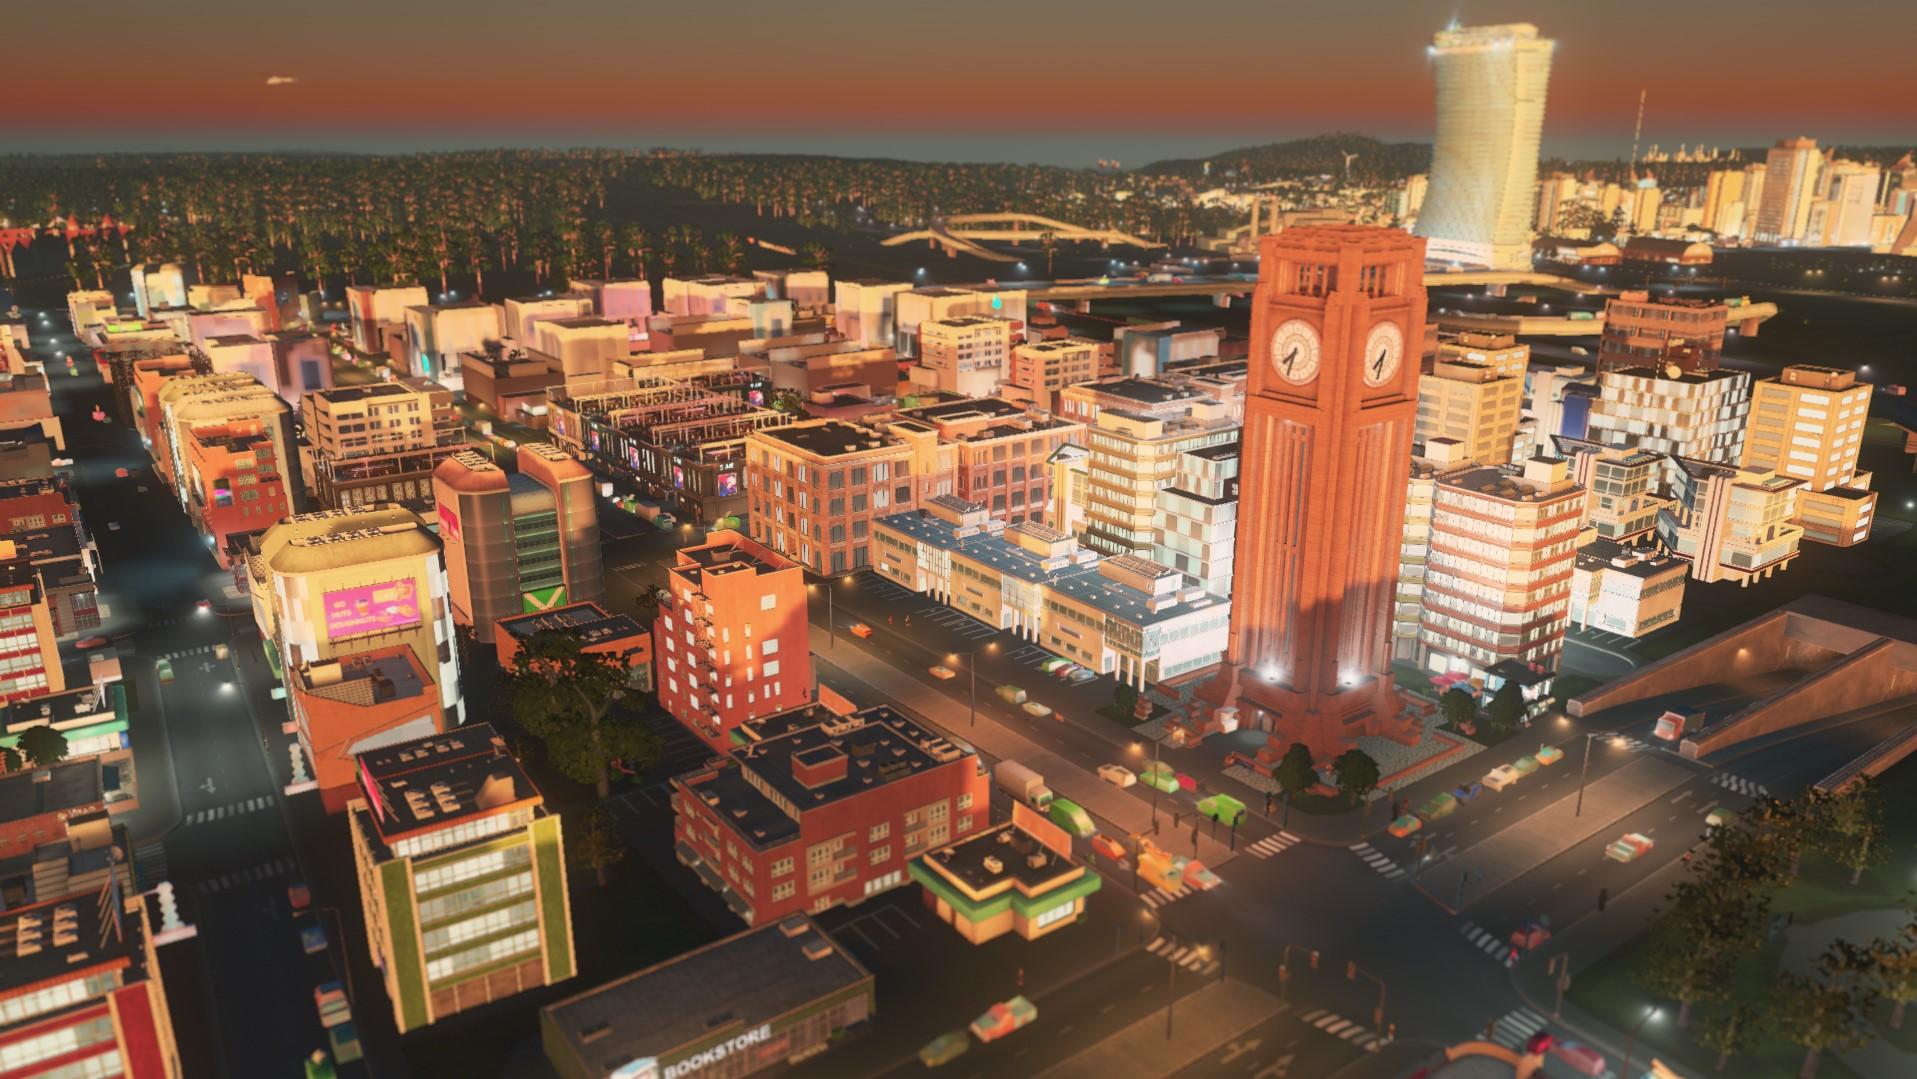 Коммерческие зоны cities skyline